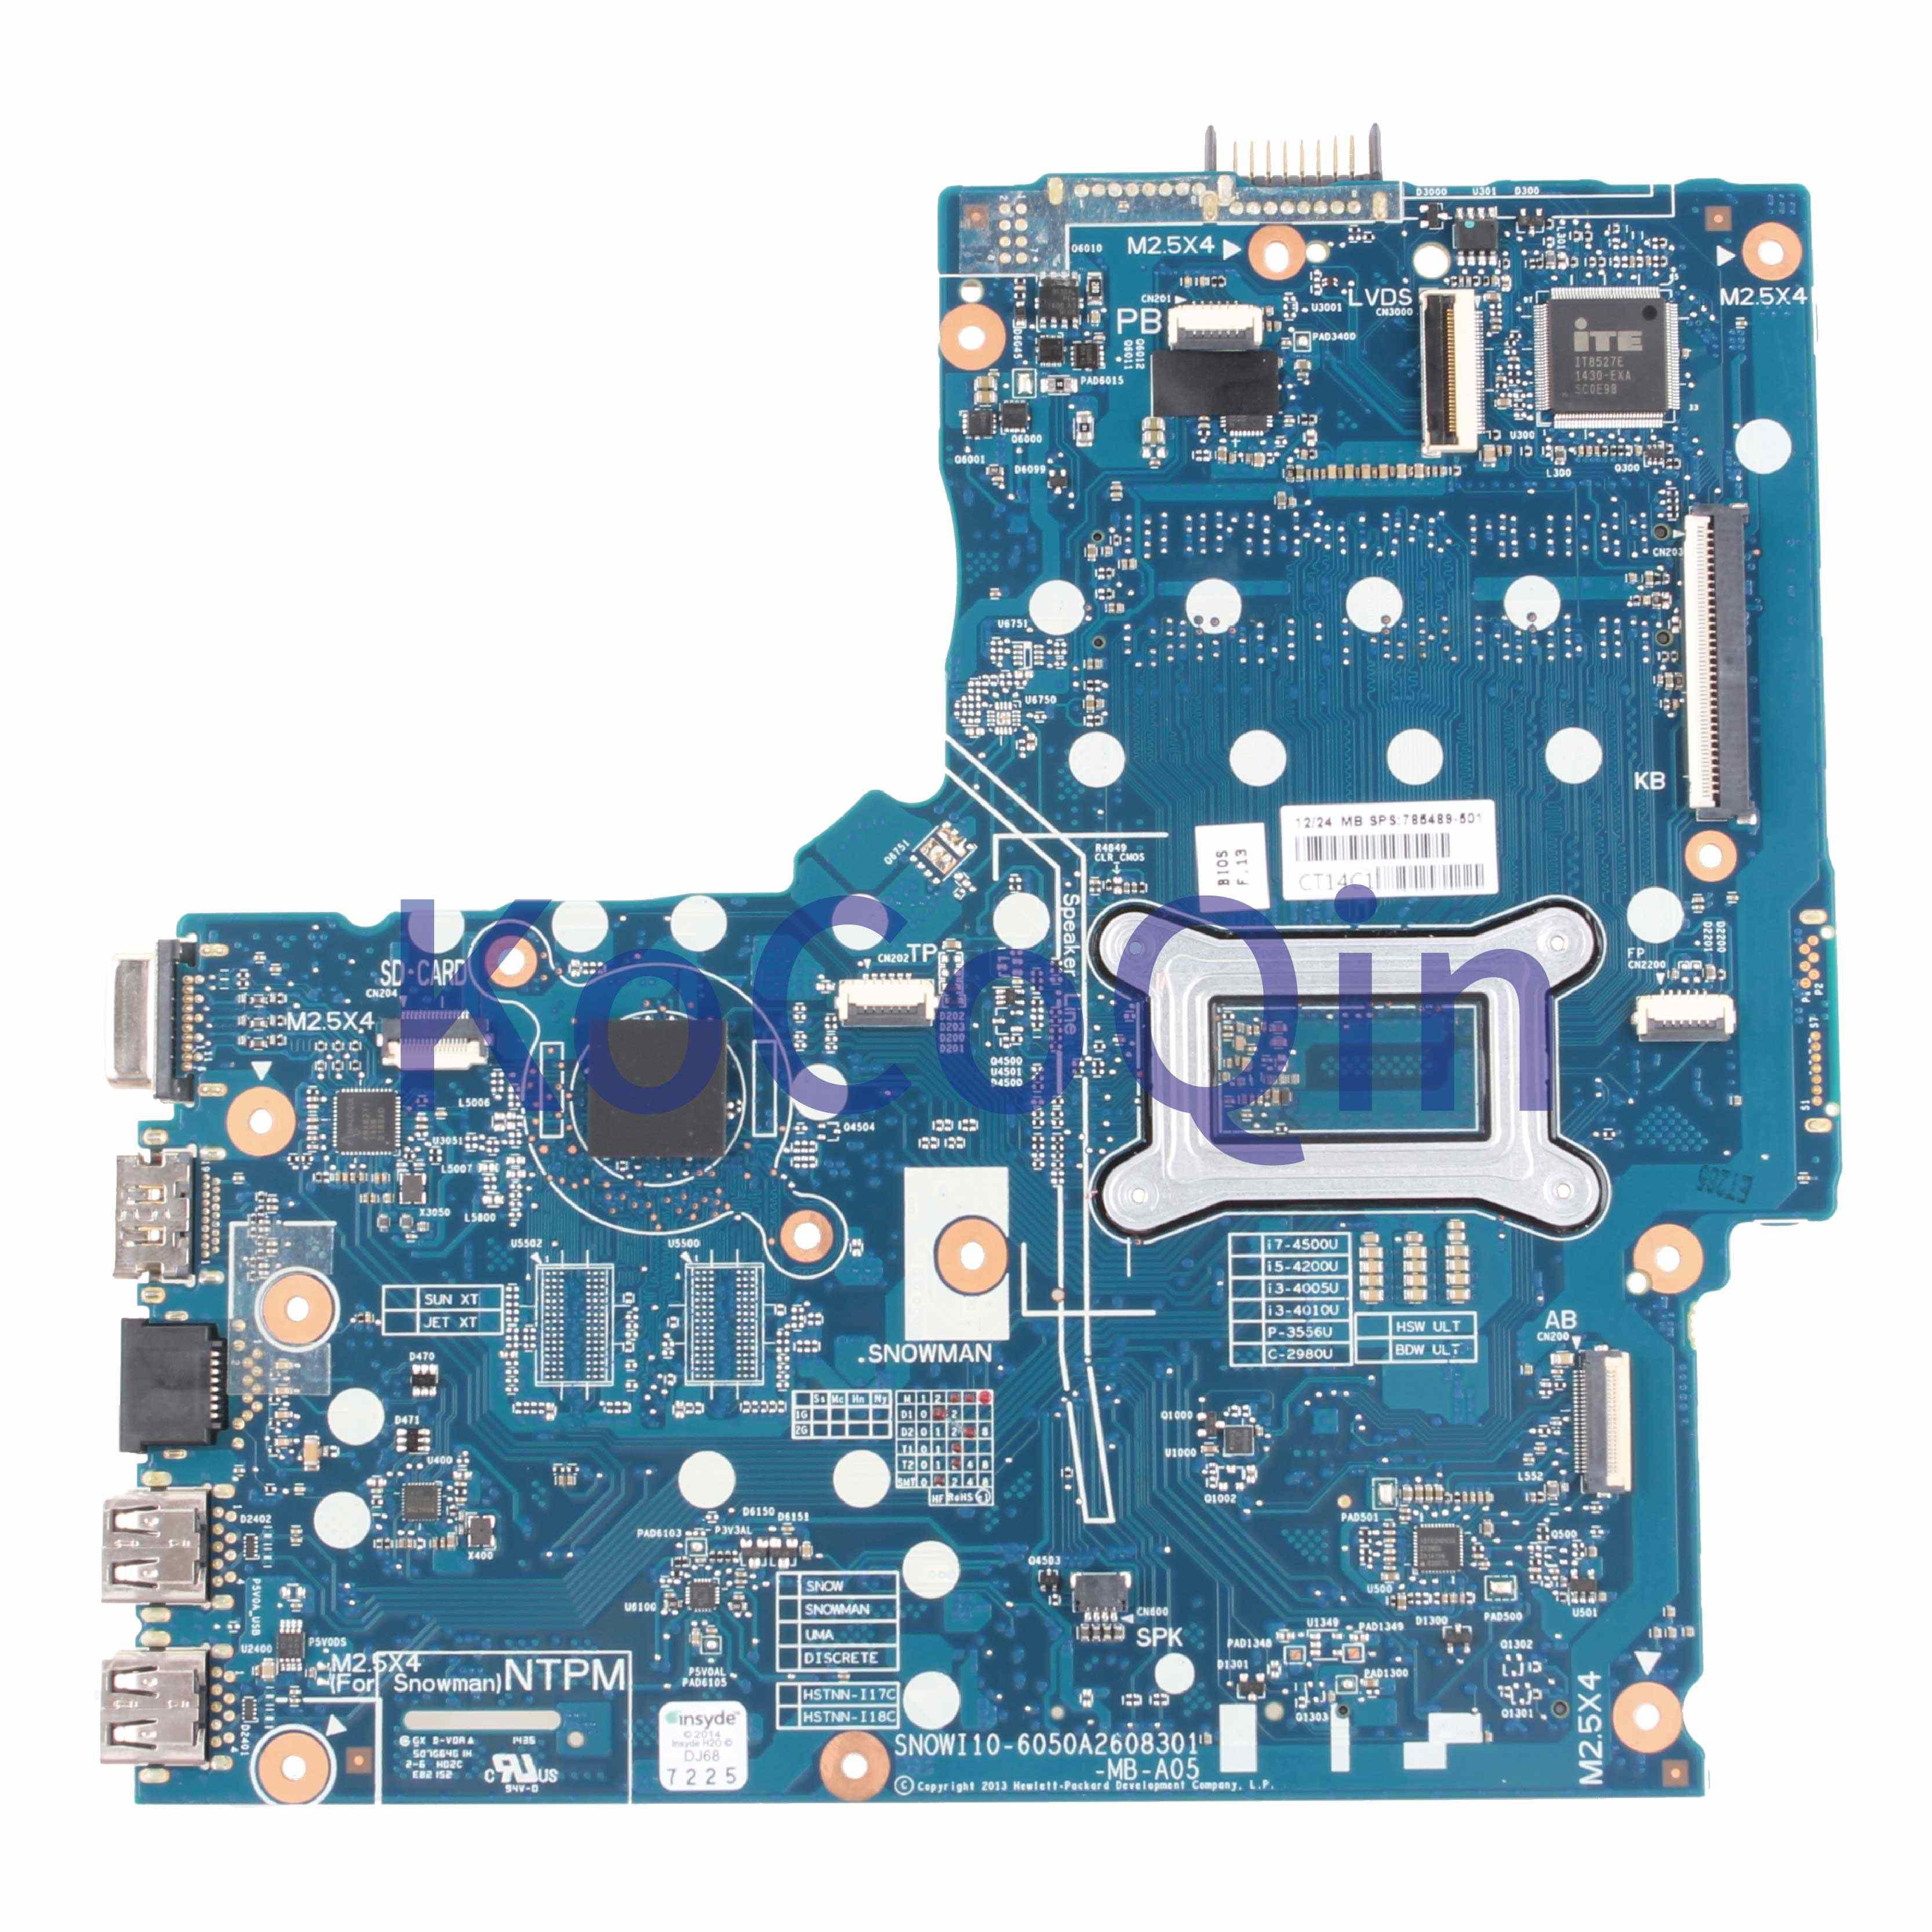 KoCoQin האם מחשב נייד עבור HP 350 G1 G2 Core I5-4200U Mainboard 785495-001 785495-601 6050A2608301 SR1EF